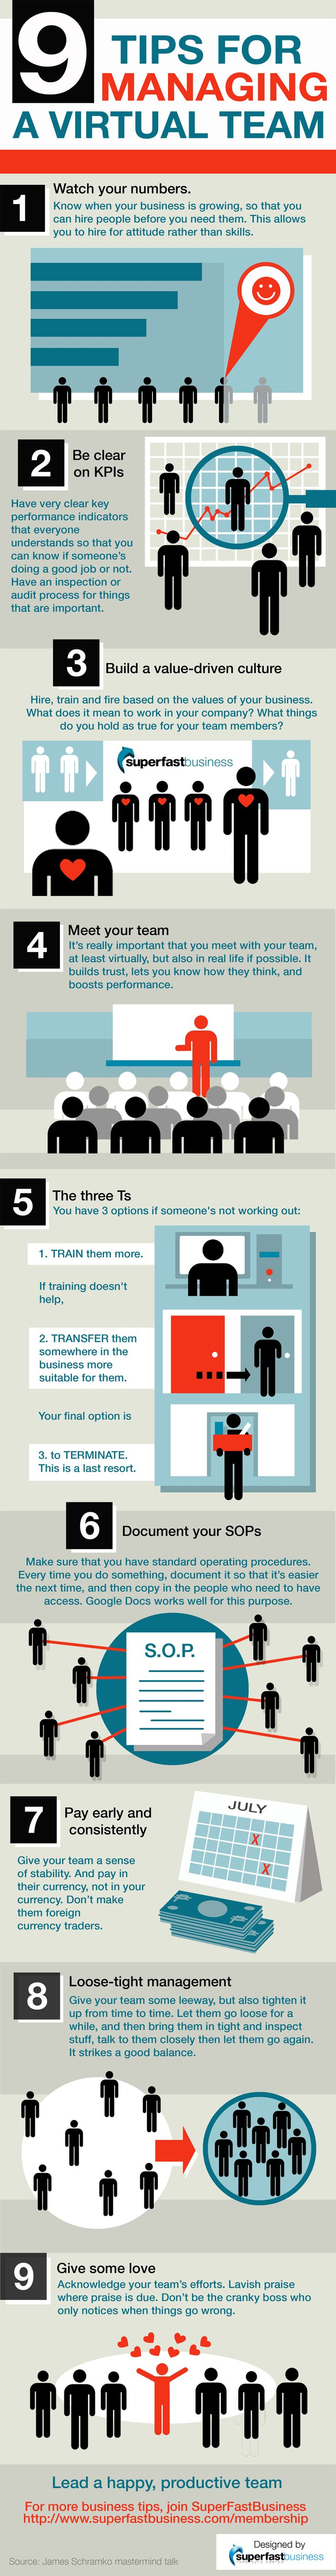 9 Tips for Managing a Virtual Team via @jamesschramko